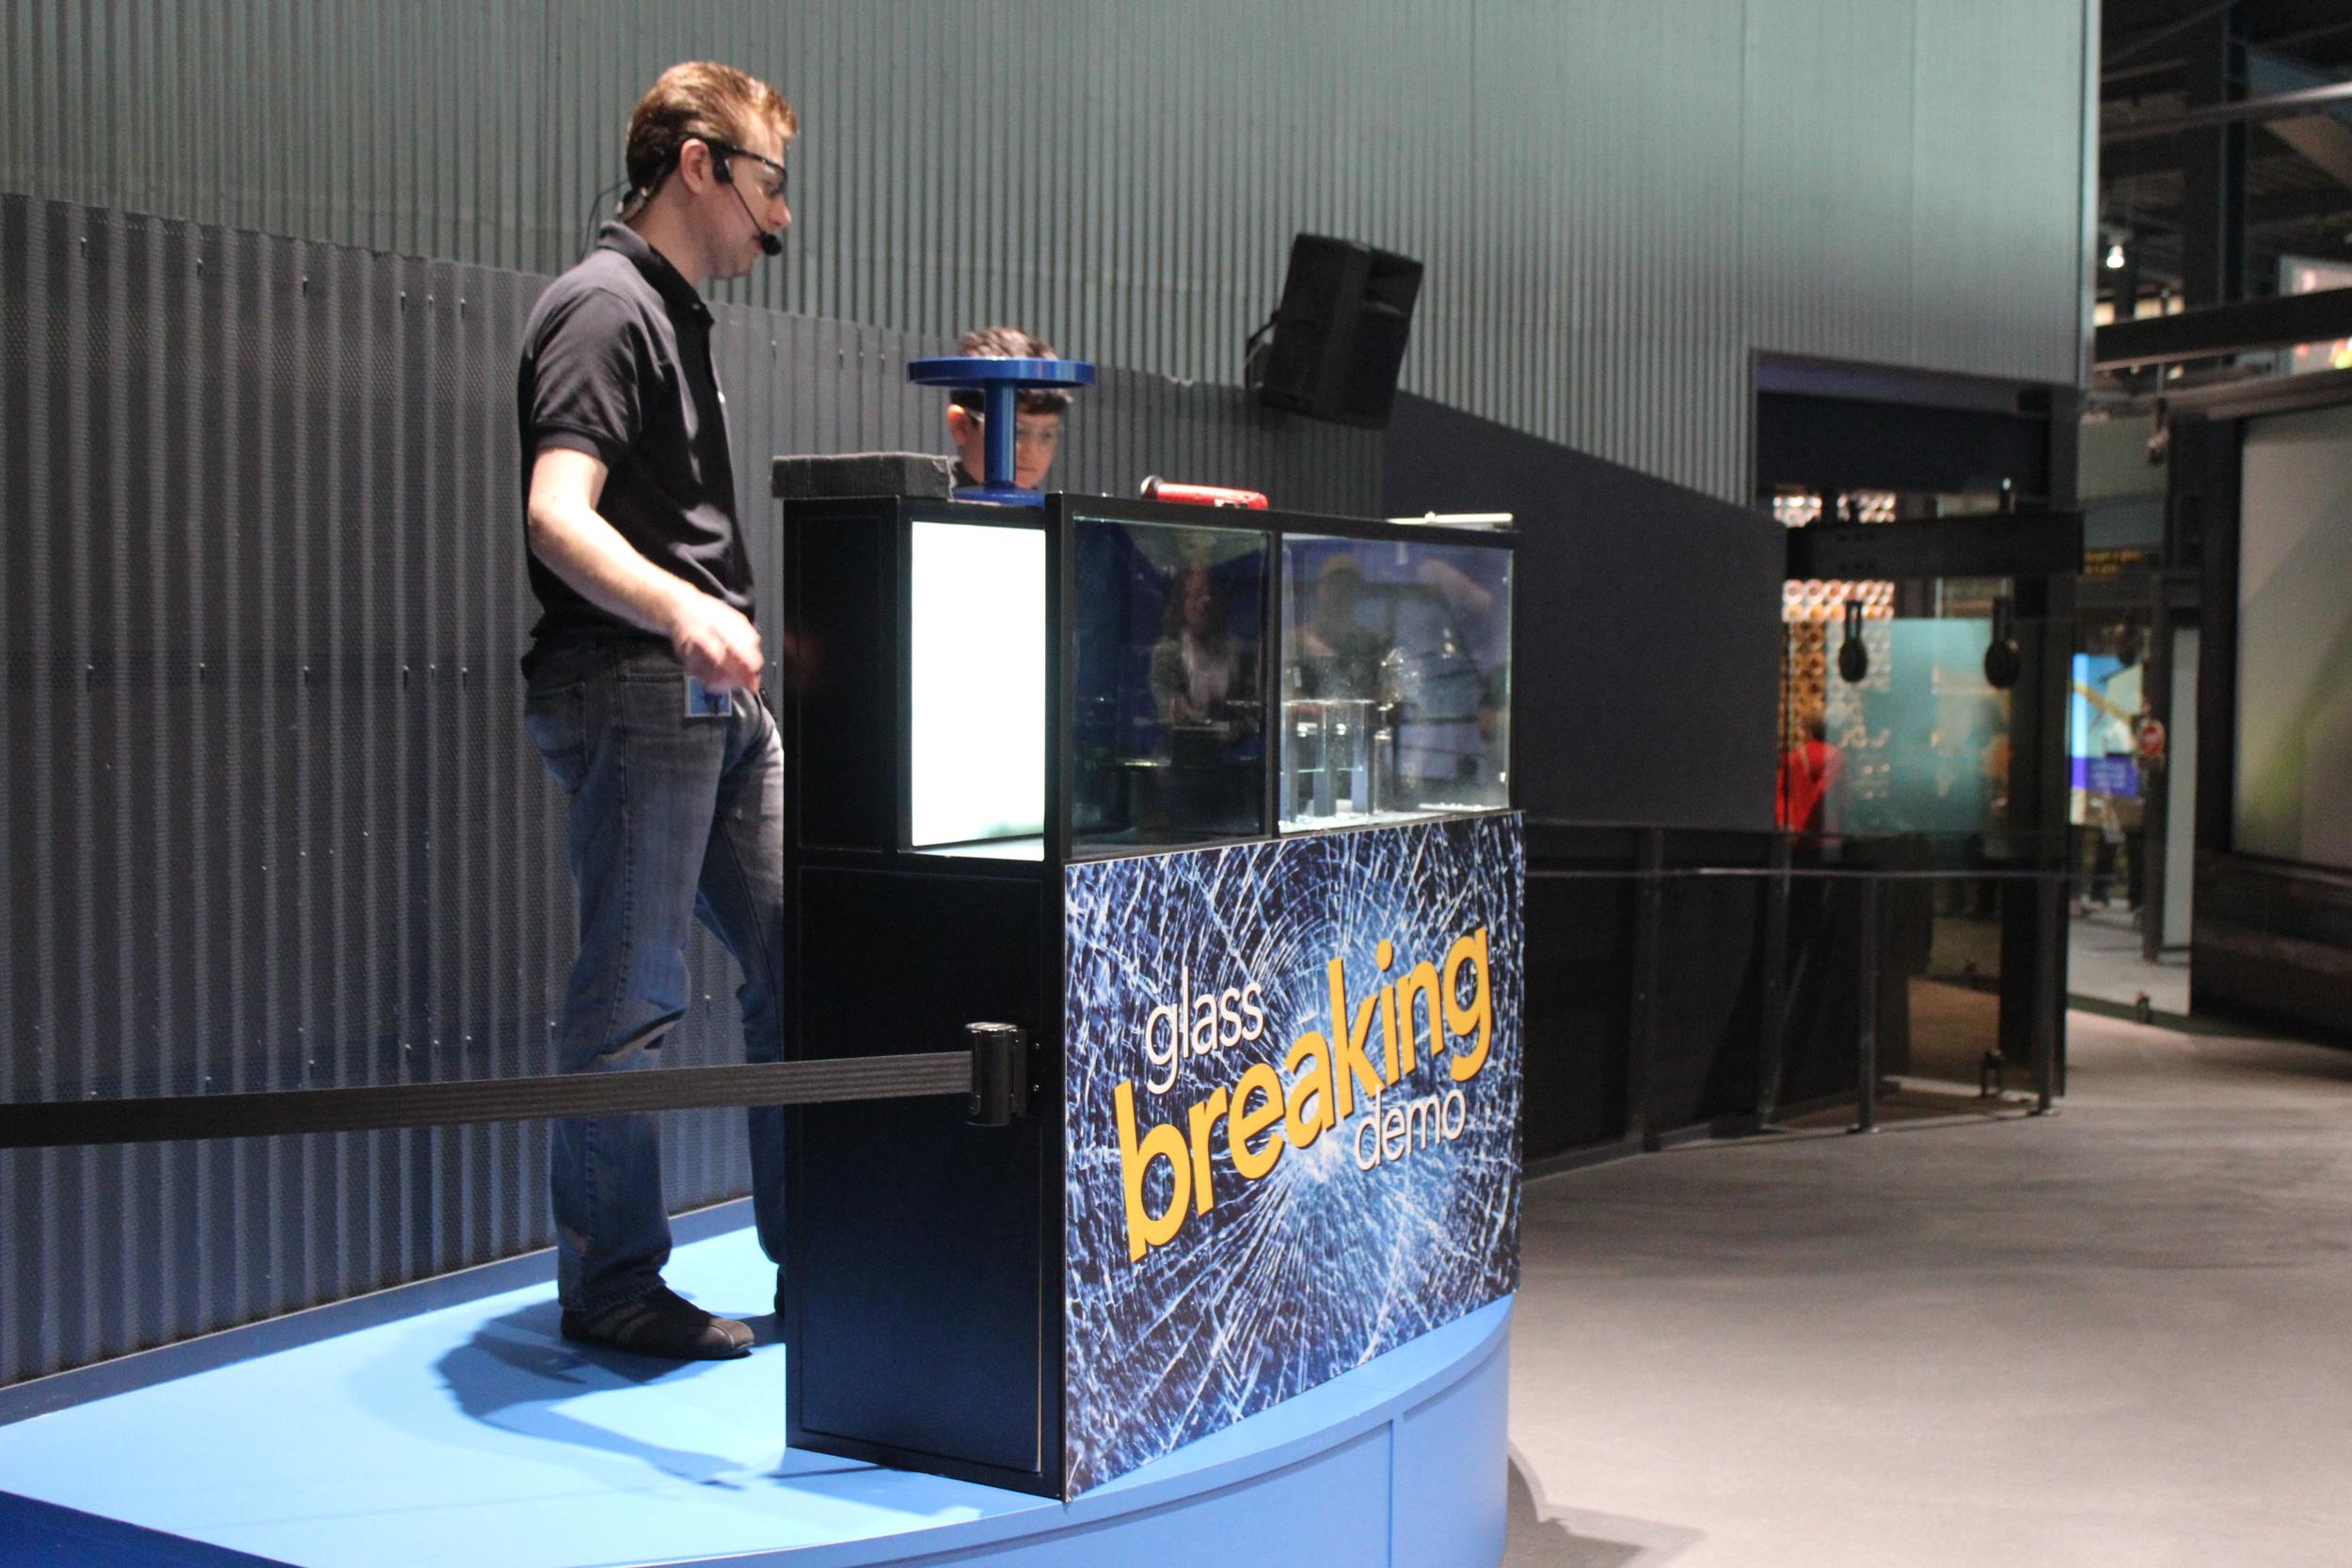 Glass-Breaking Demo